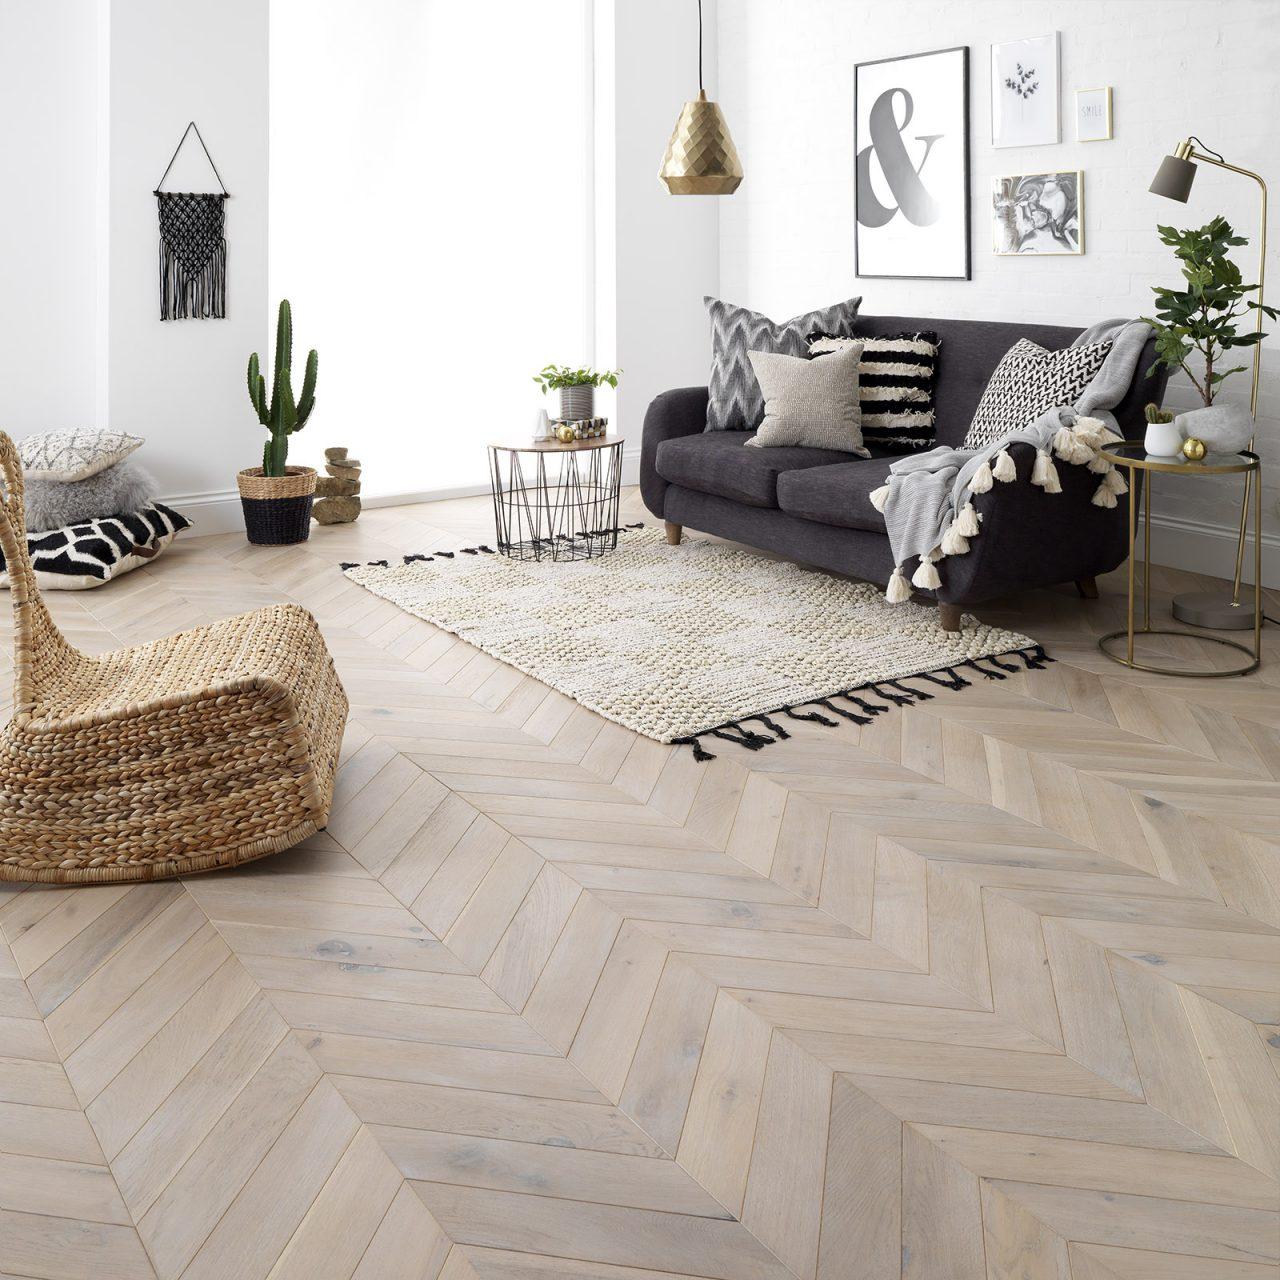 engineered chevron wood flooring. Living room with beautiful greige parquet wood flooring